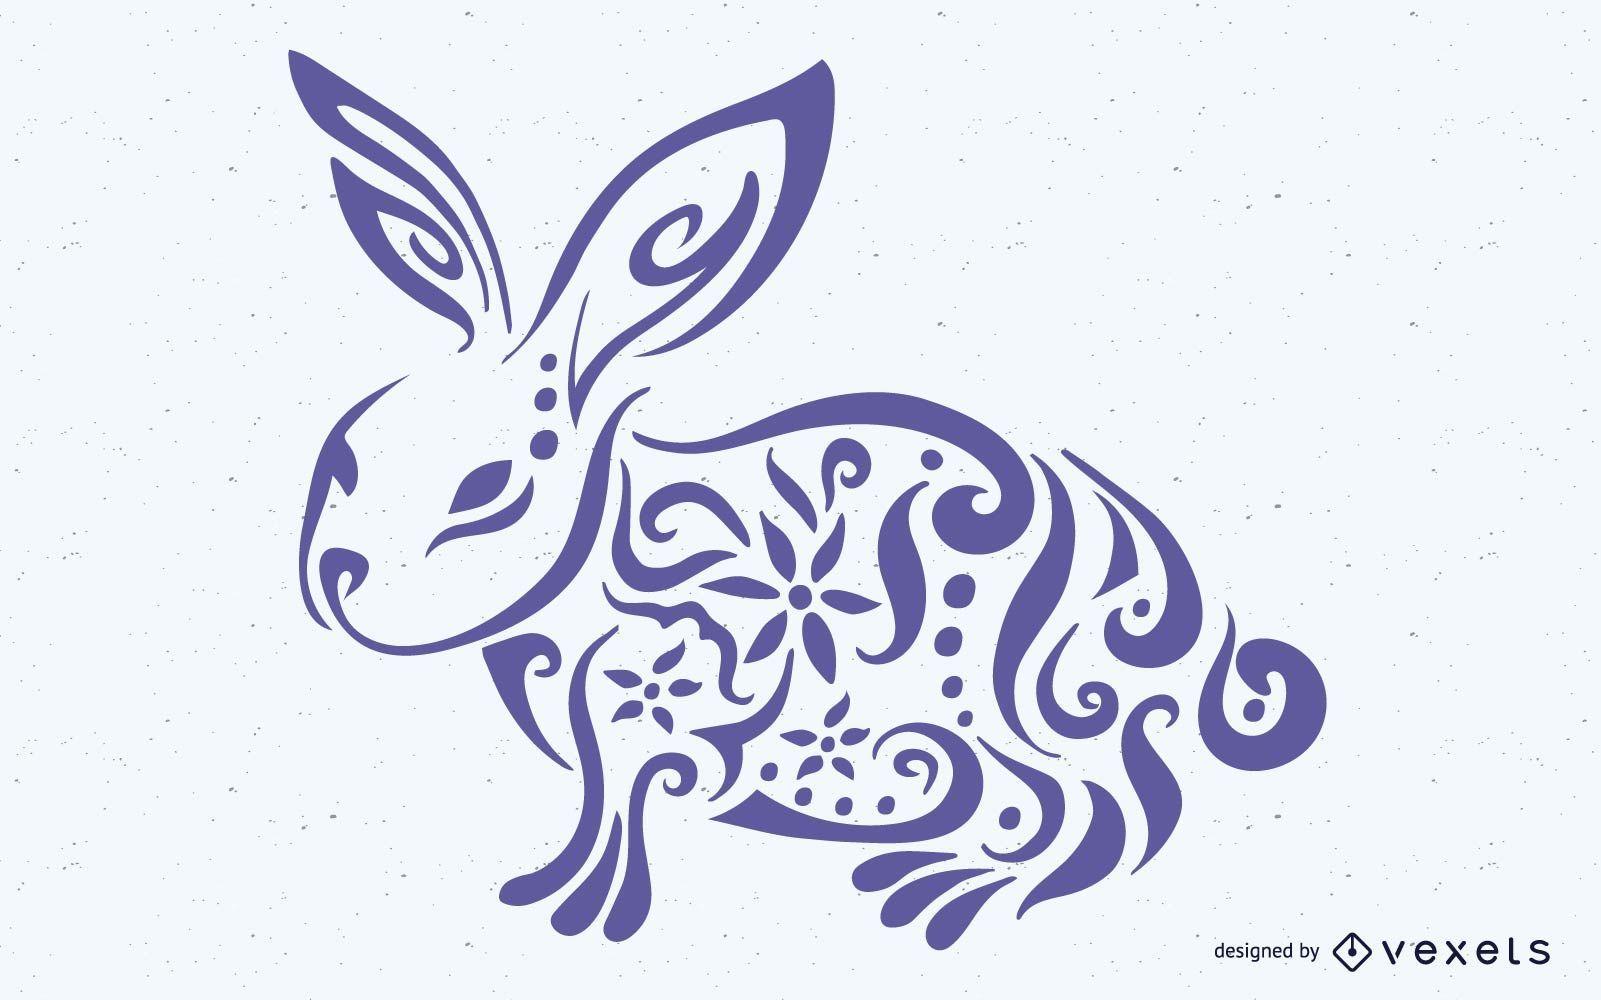 Decorative Floral Formed Bunny Easter